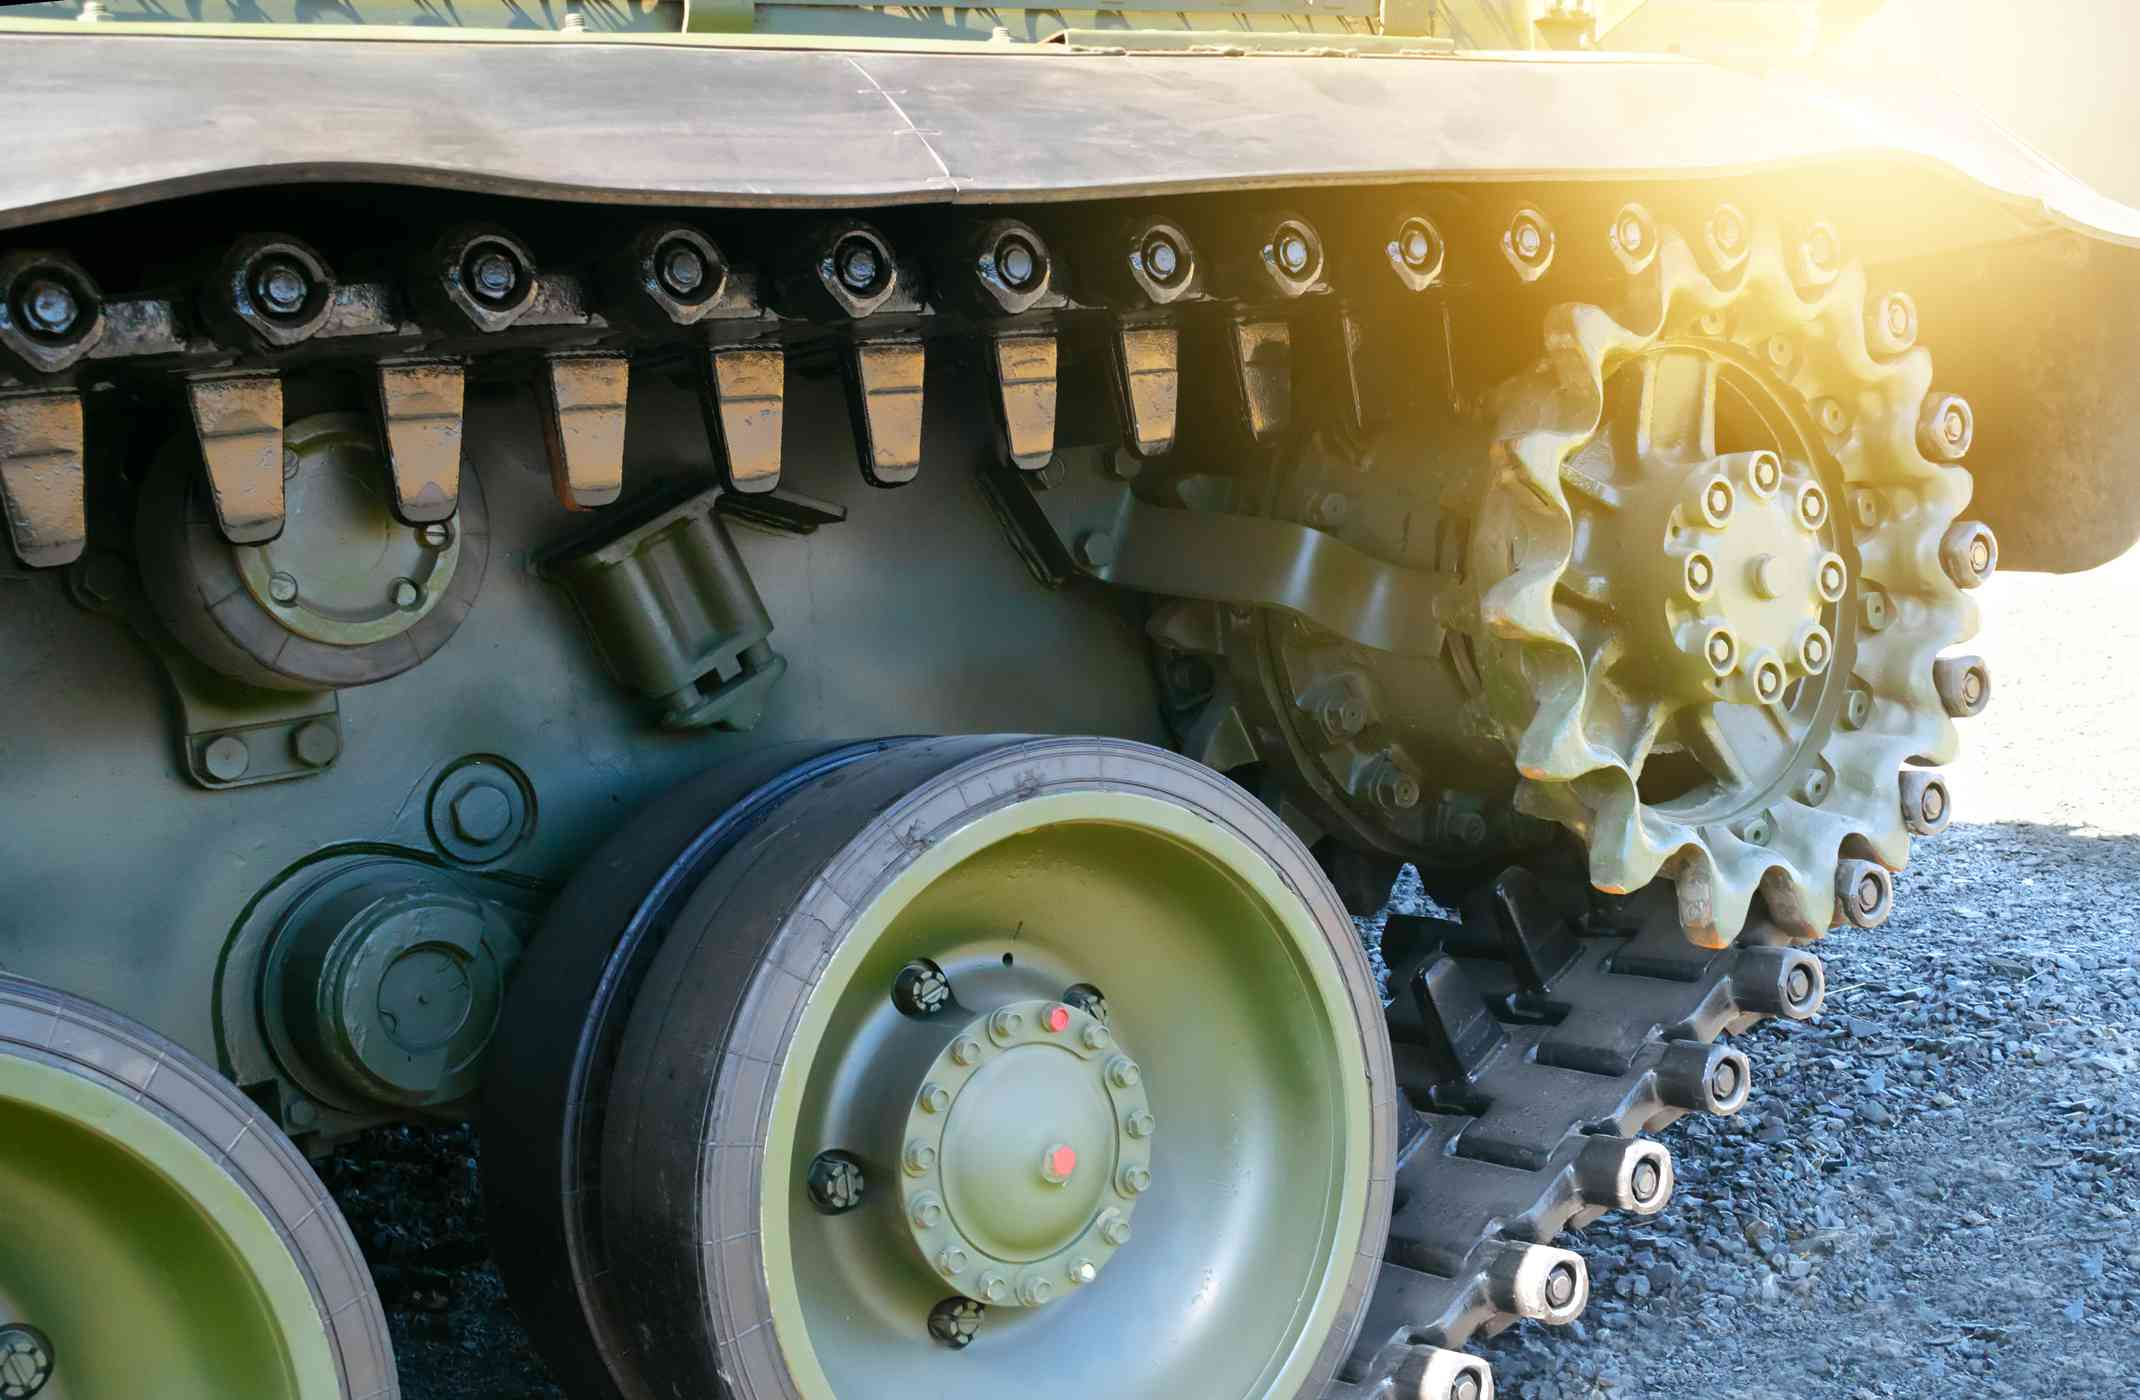 Tracks on a military vehicle.